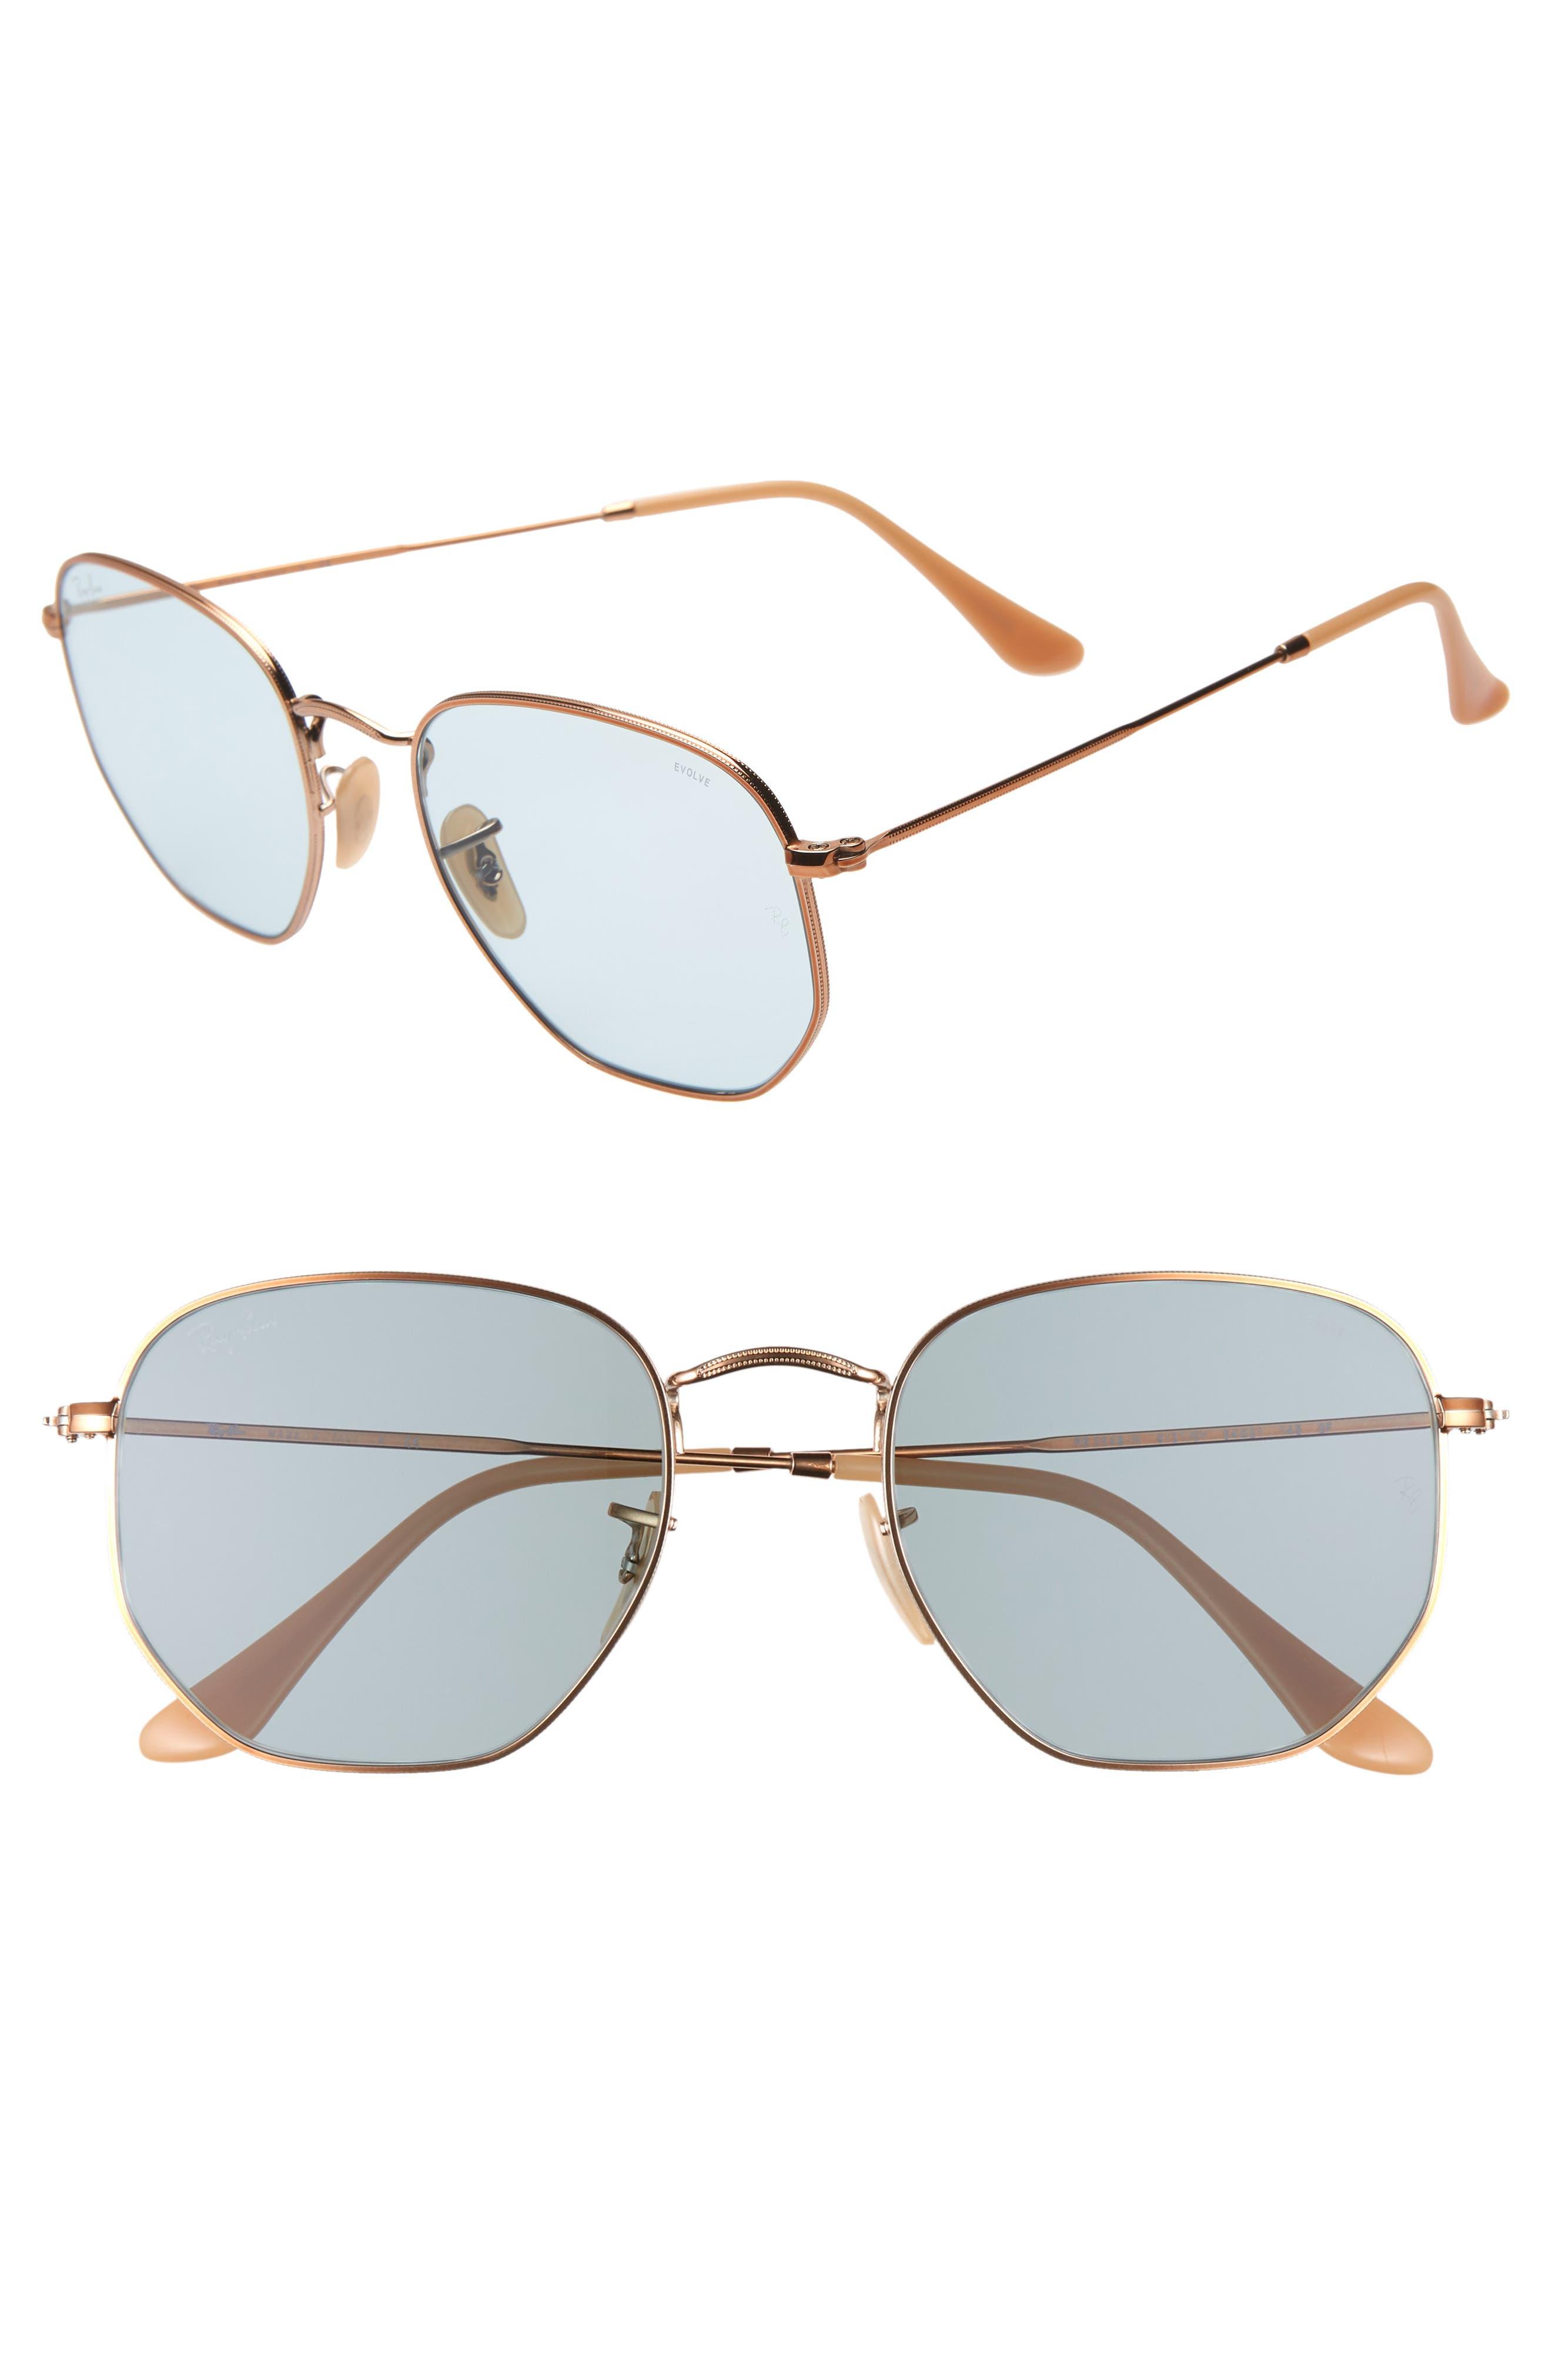 RAY-BAN 54mm Evolve Photochromic Hexagon Sunglasses, Main, color, GOLD/ LIGHT BLUE SOLID